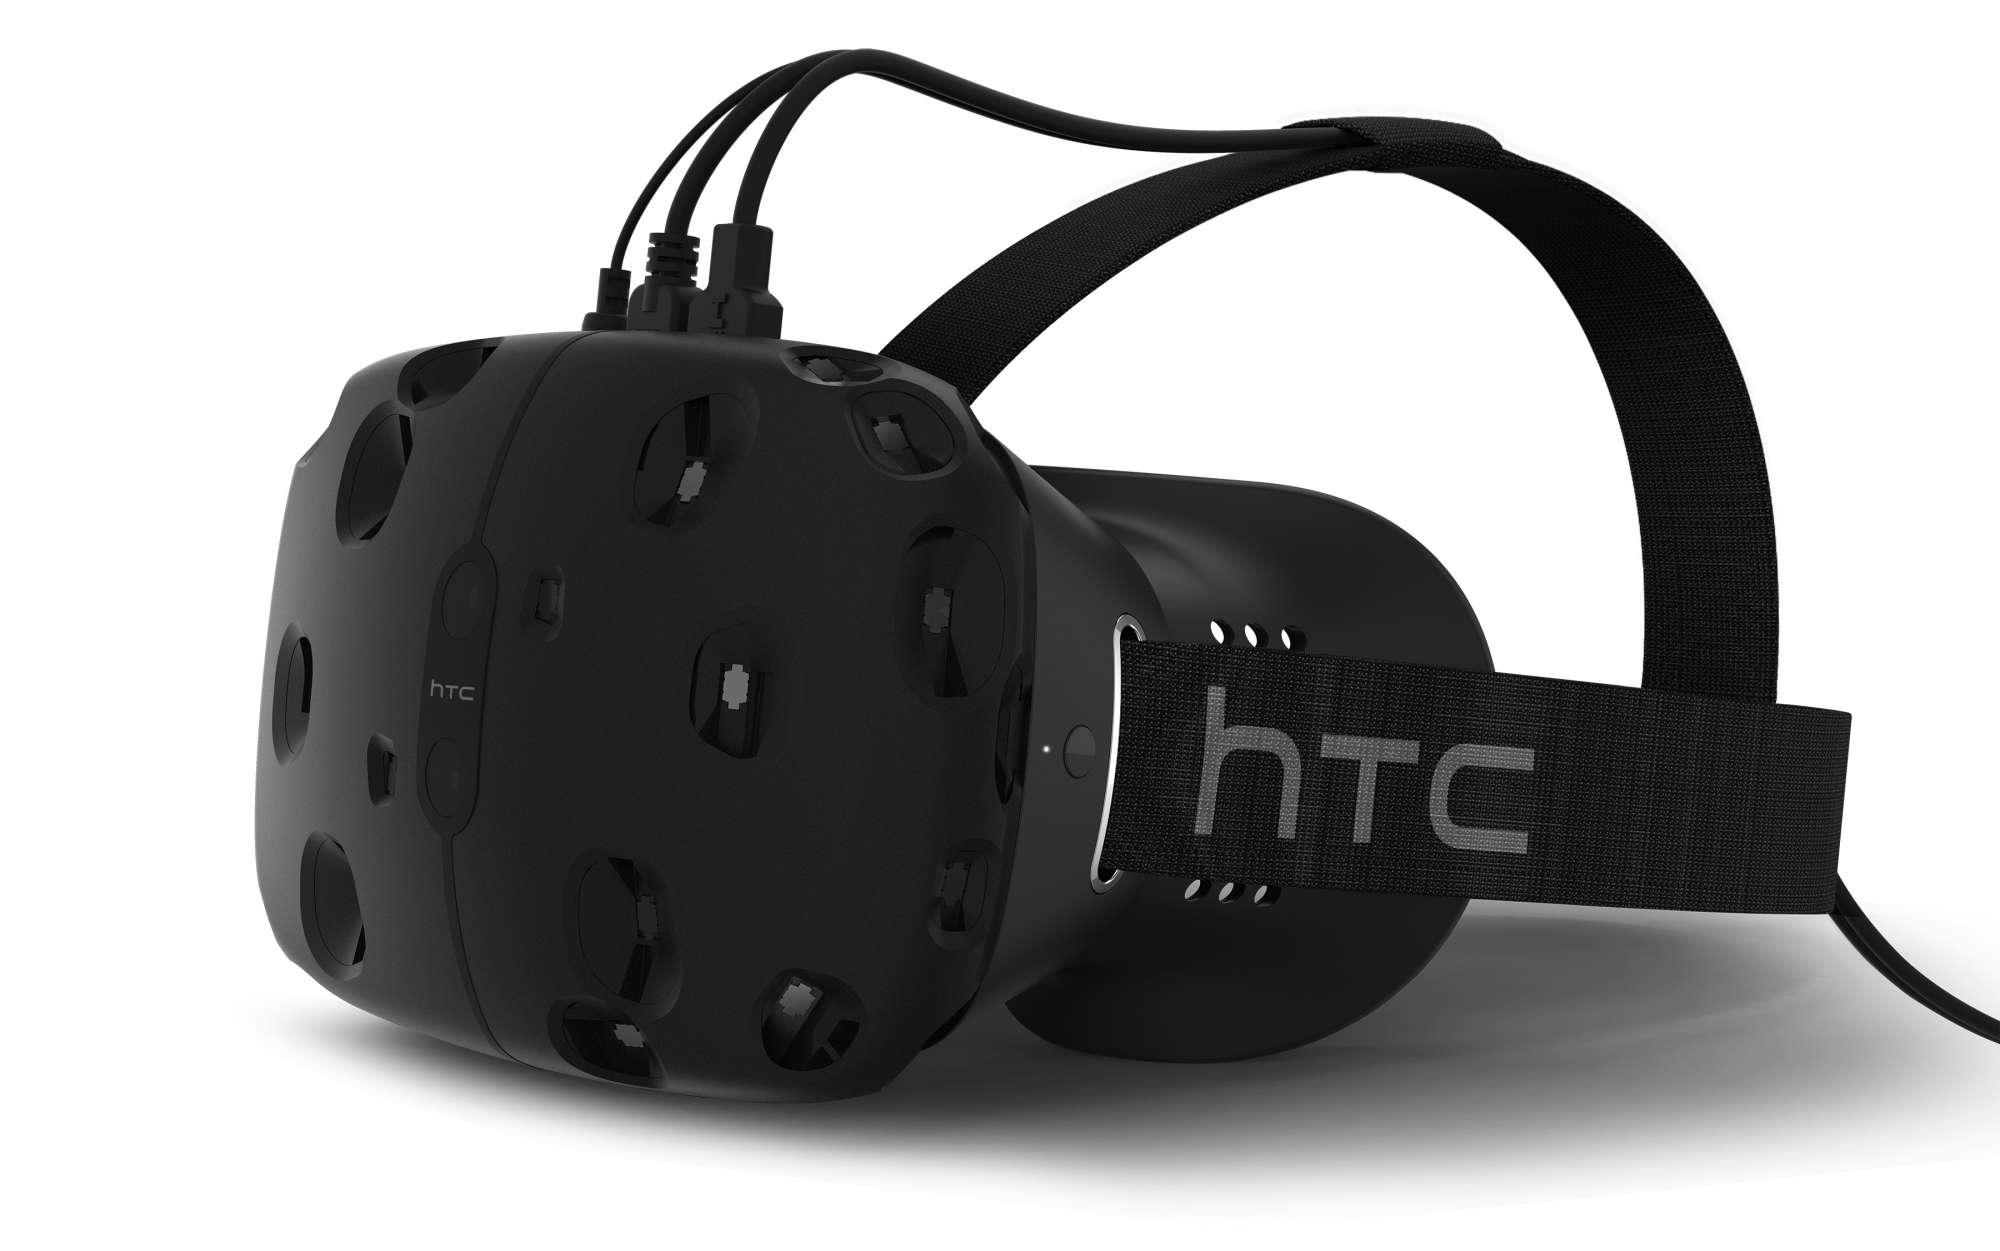 Second gen HTC Vive. Image Credit: Popsci